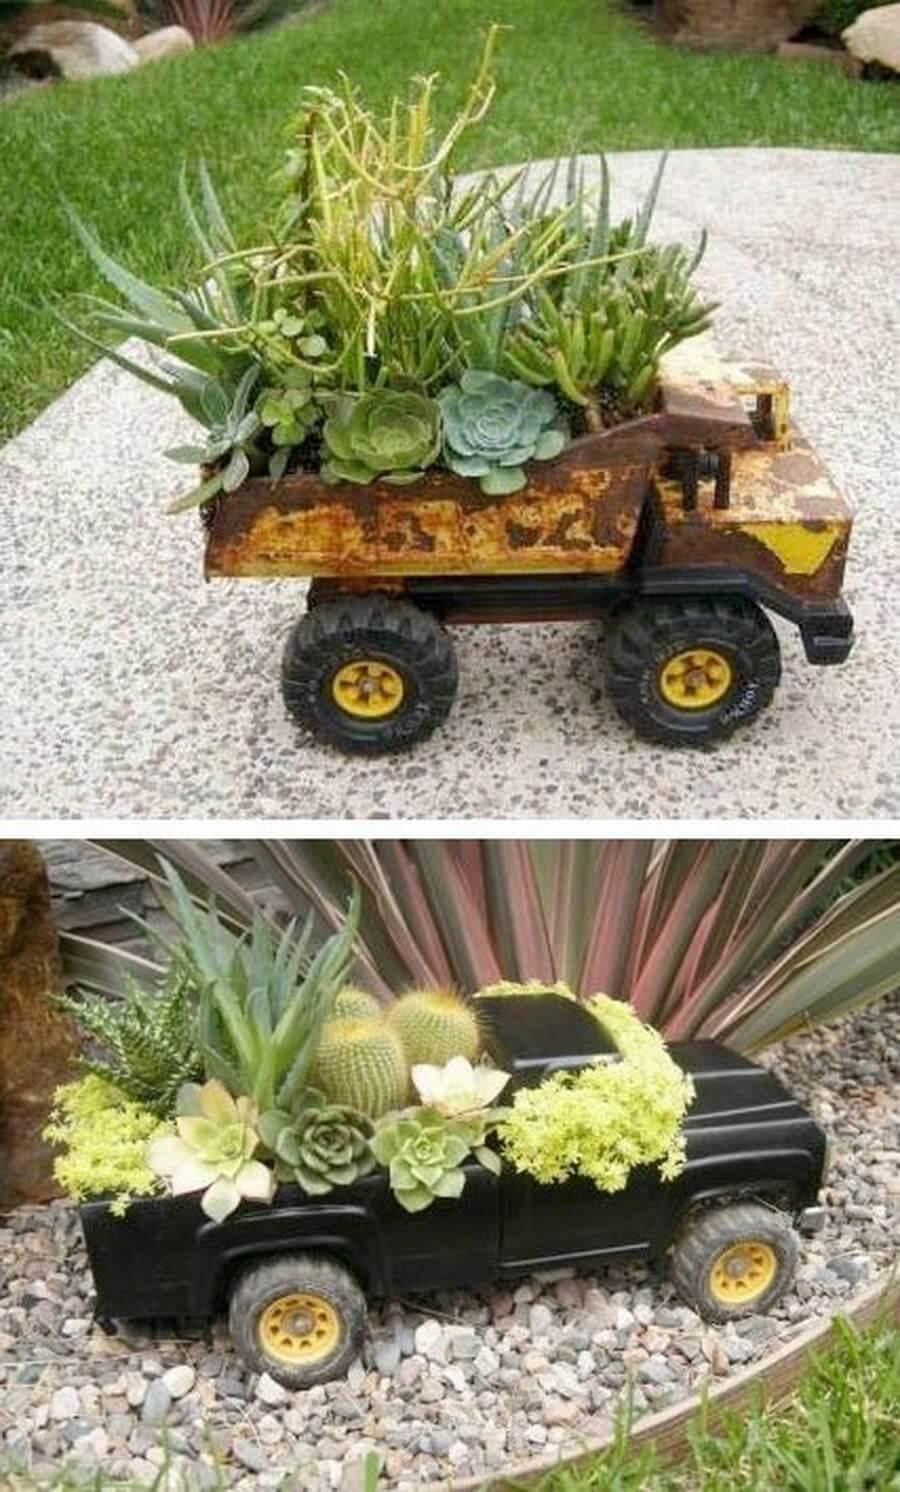 Gardeners Supply Company Modern Blue Steel Mobile Garden Planter Cart Rolling Patio Planter on Wheels